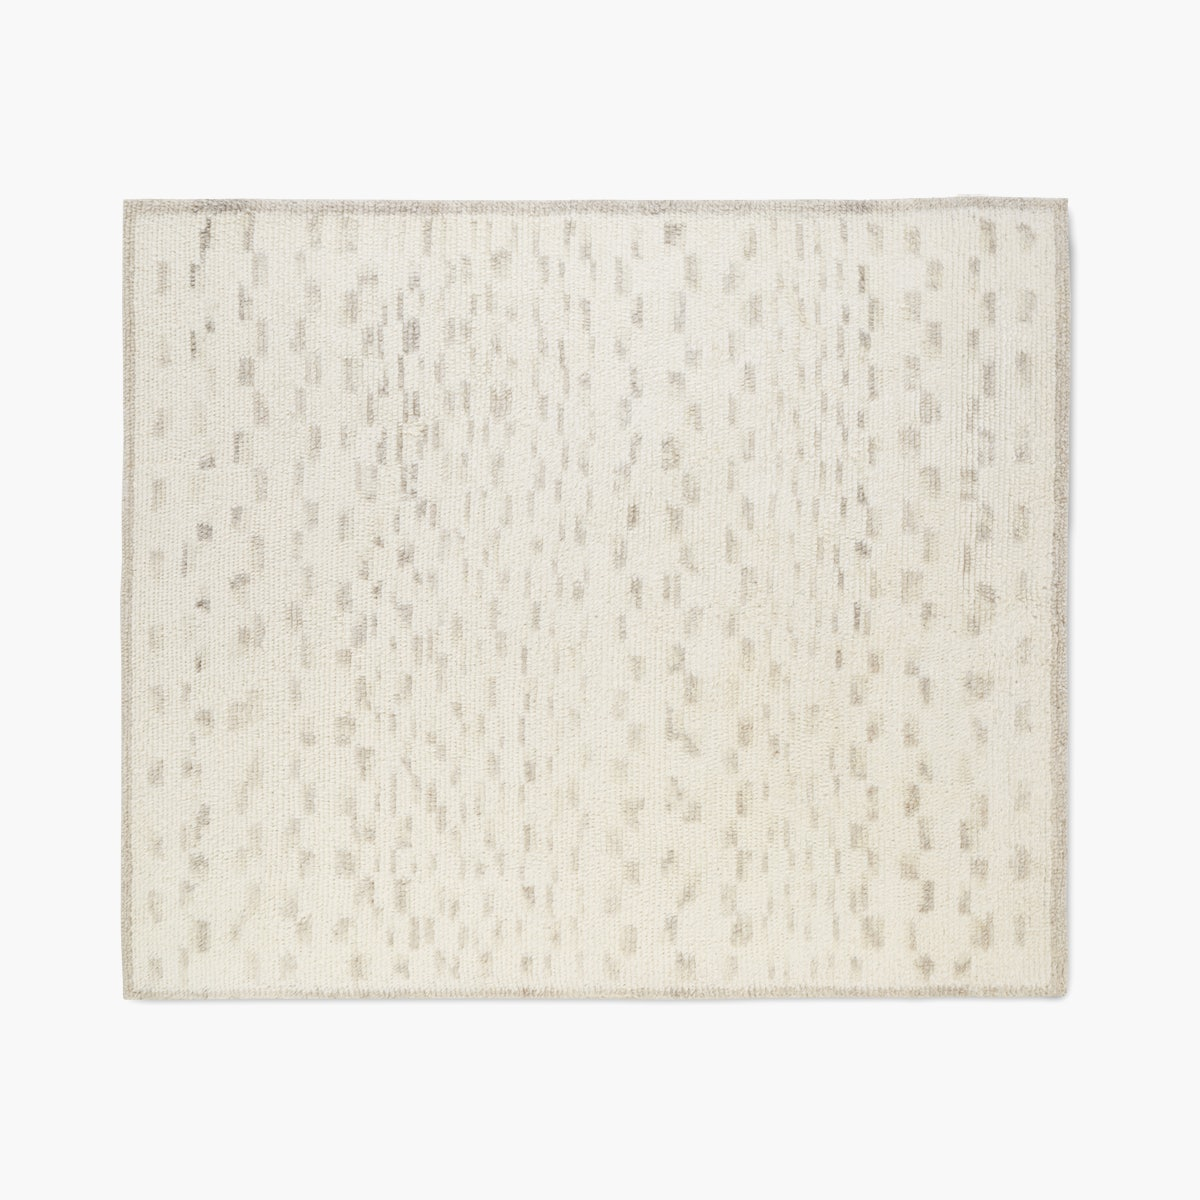 Marl Handwoven Moroccan Wool Rug